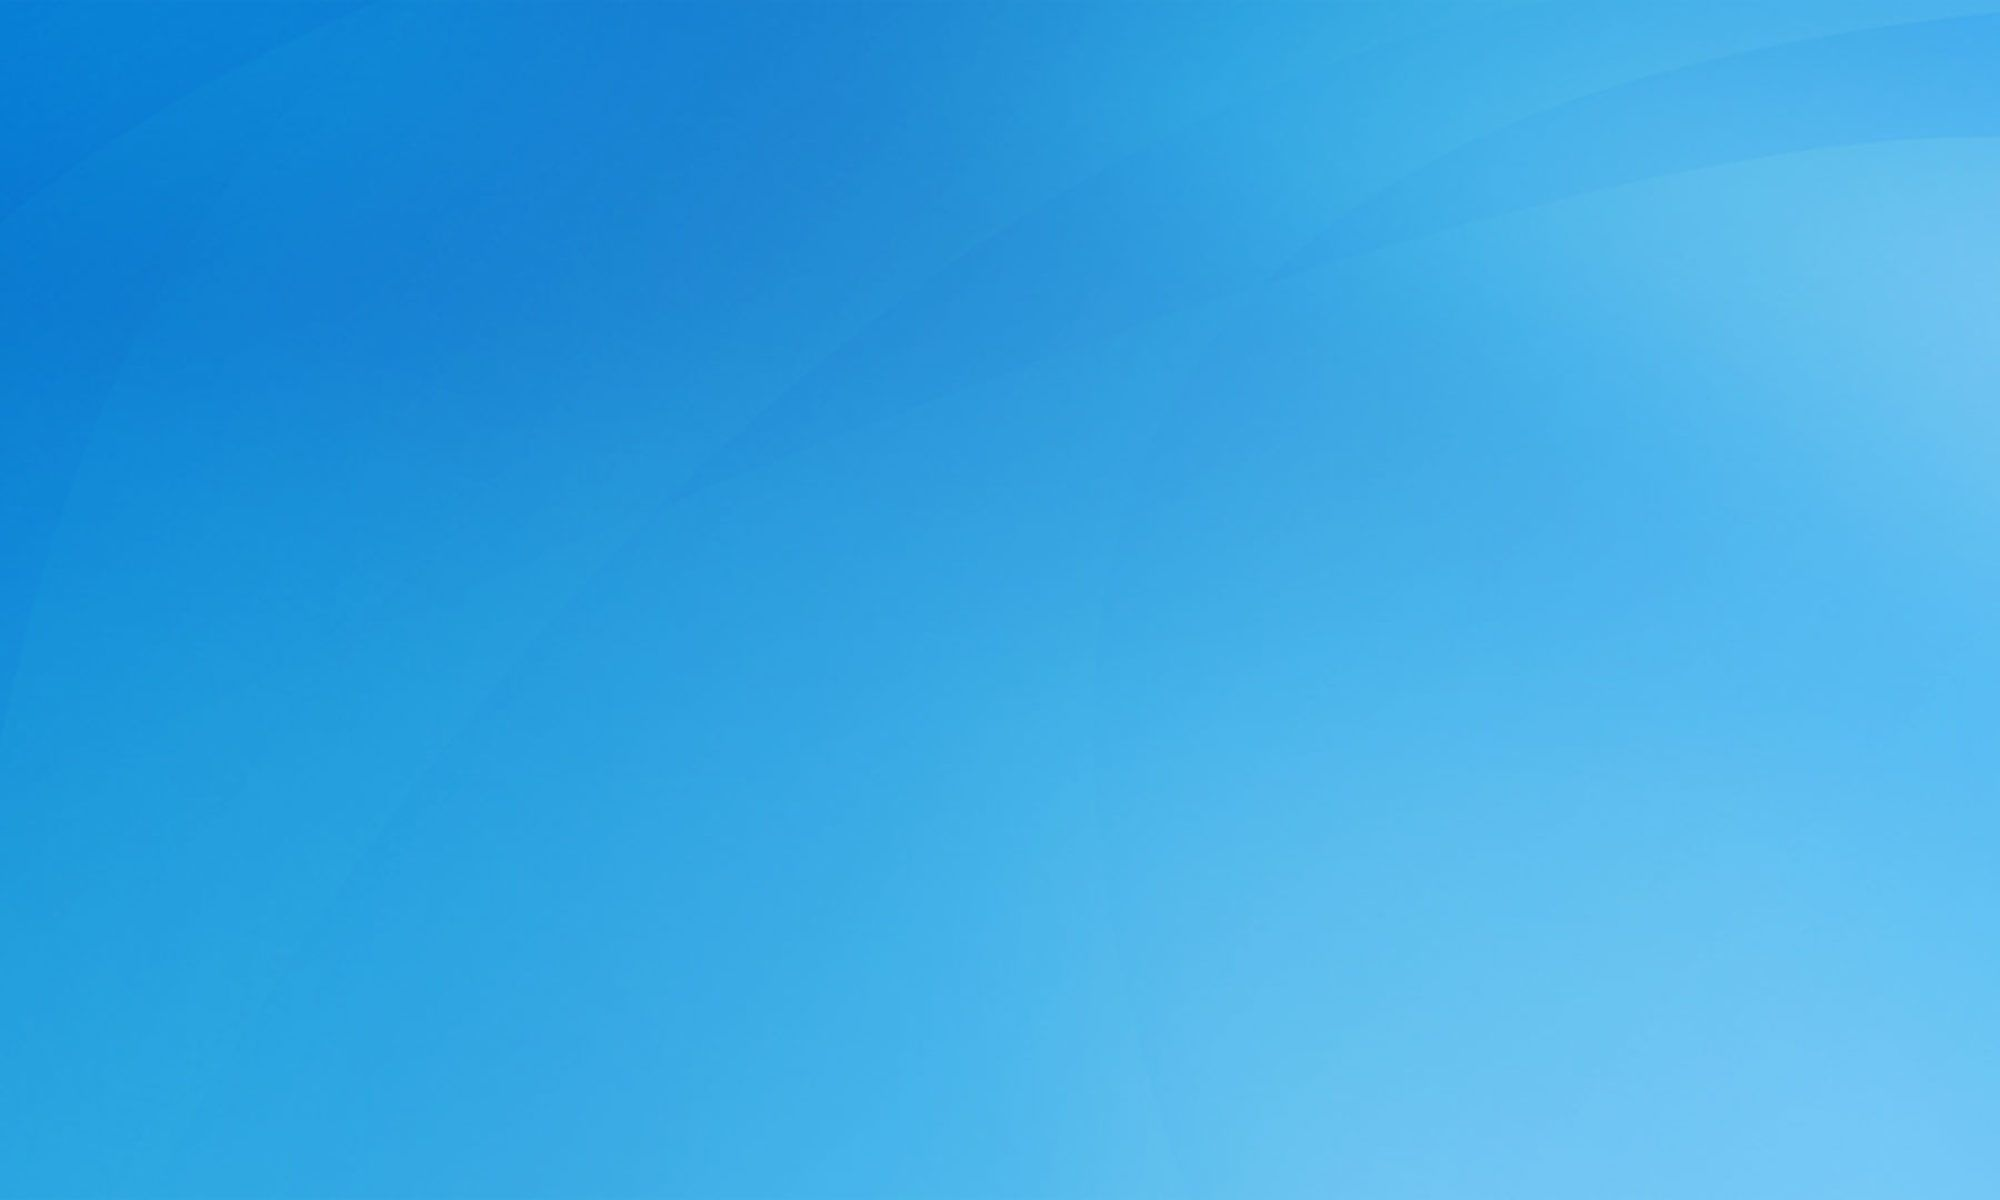 Plain Blue Wallpapers on WallpaperDog